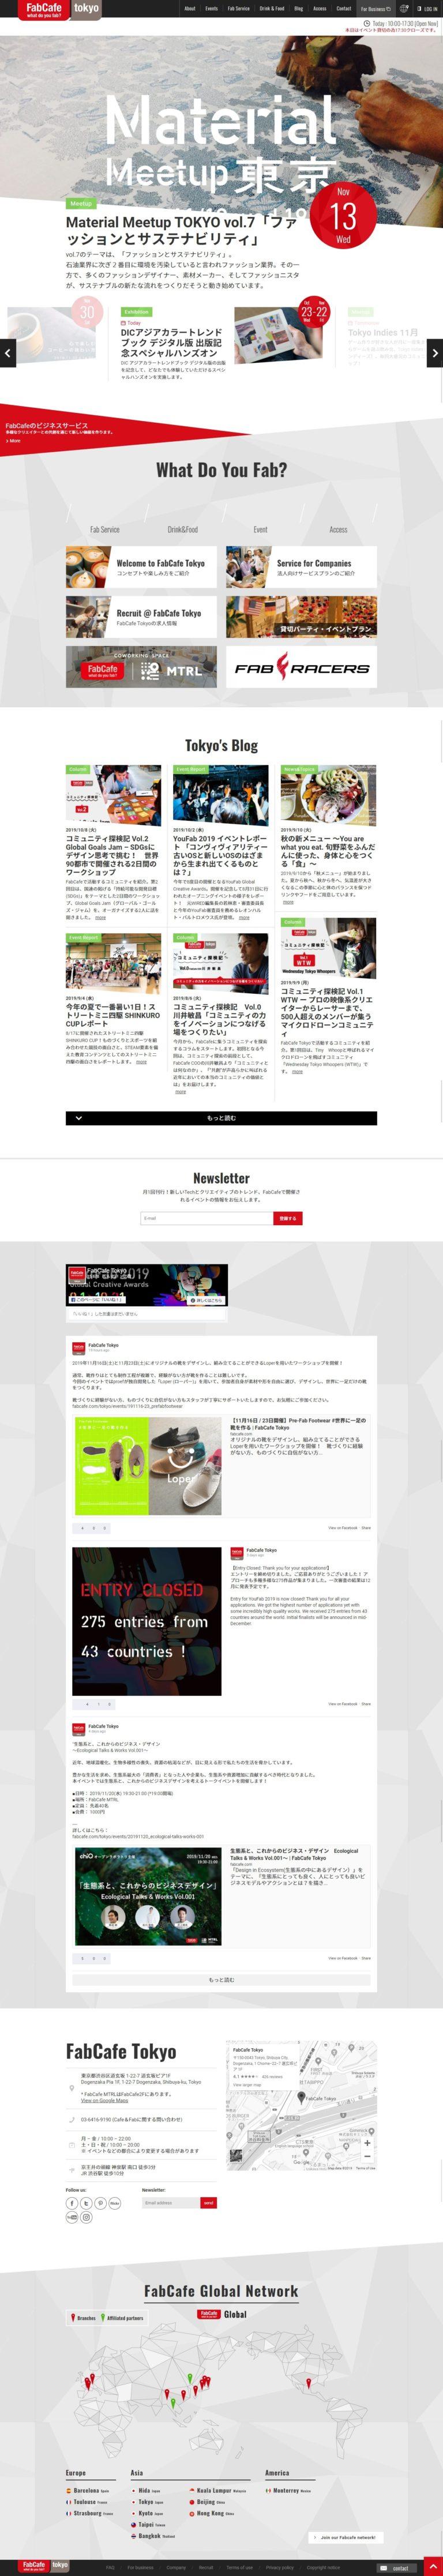 FabCafe Tokyo | 3Dプリンタとレーザーカッターが使える渋谷のカフェ